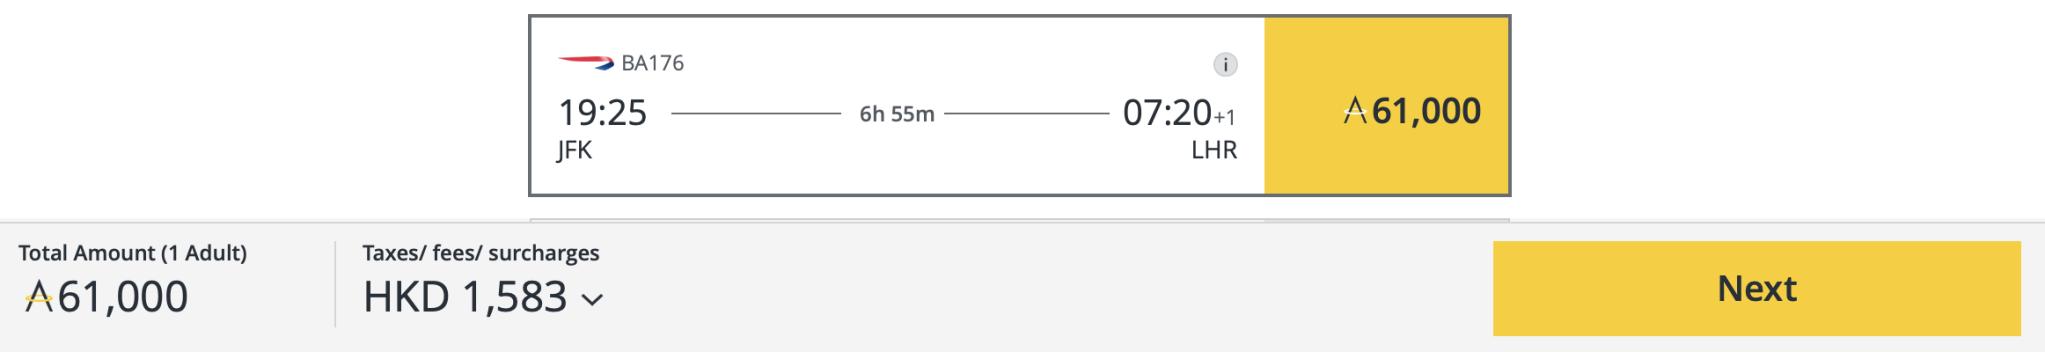 British Airways Pricing with Asia Miles